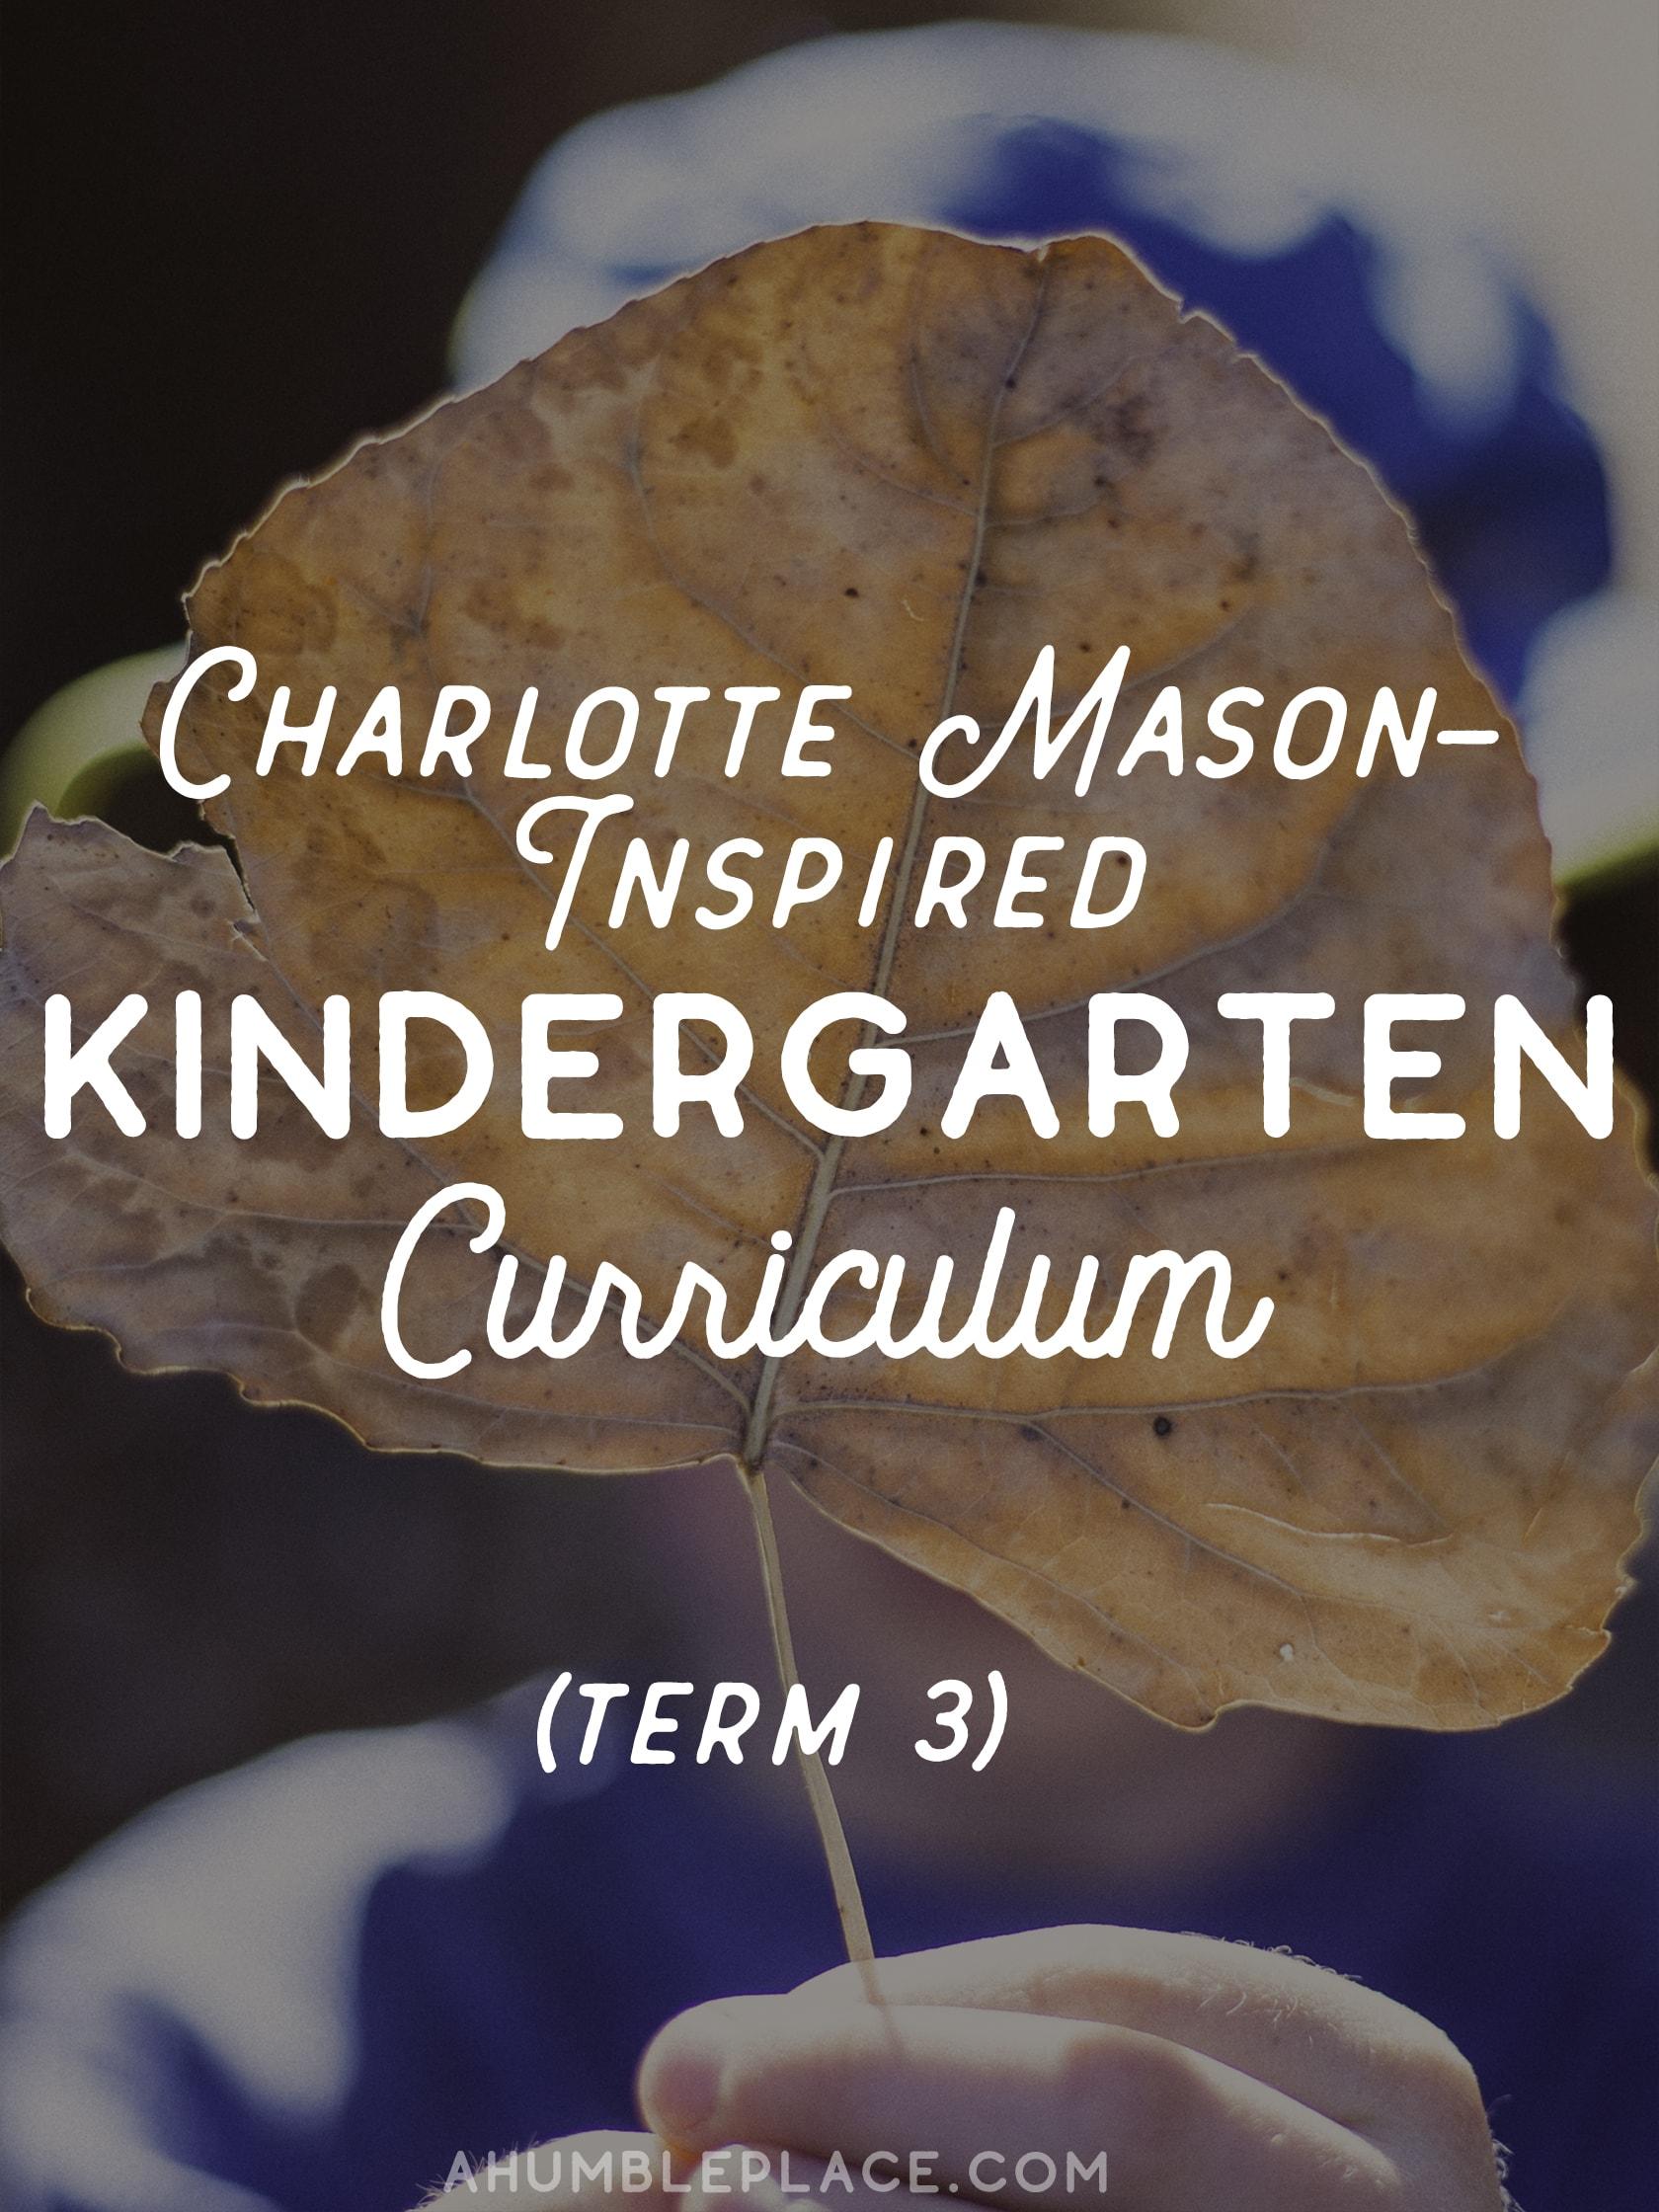 Charlotte Mason-Inspired Kindergarten Curriculum - ahumbleplace.com